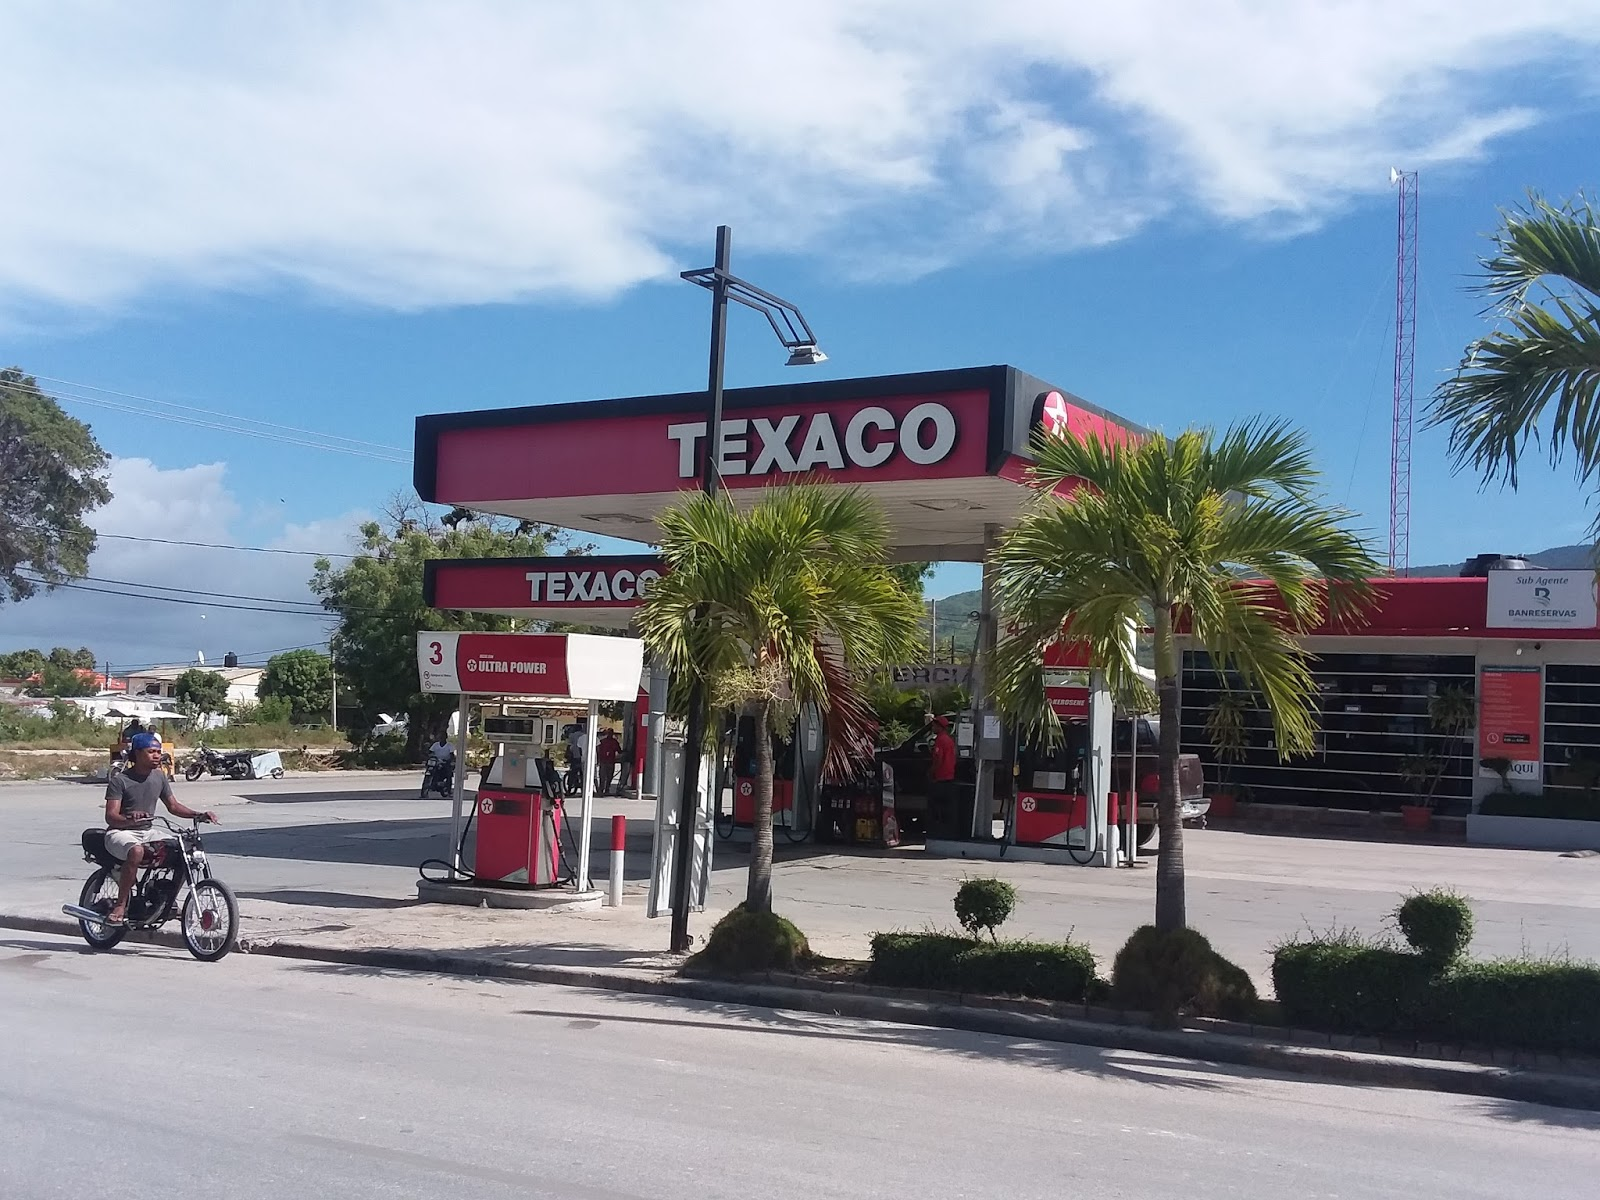 De último momento desconocidos  atracan la estación de combustible Texaco de Barahona